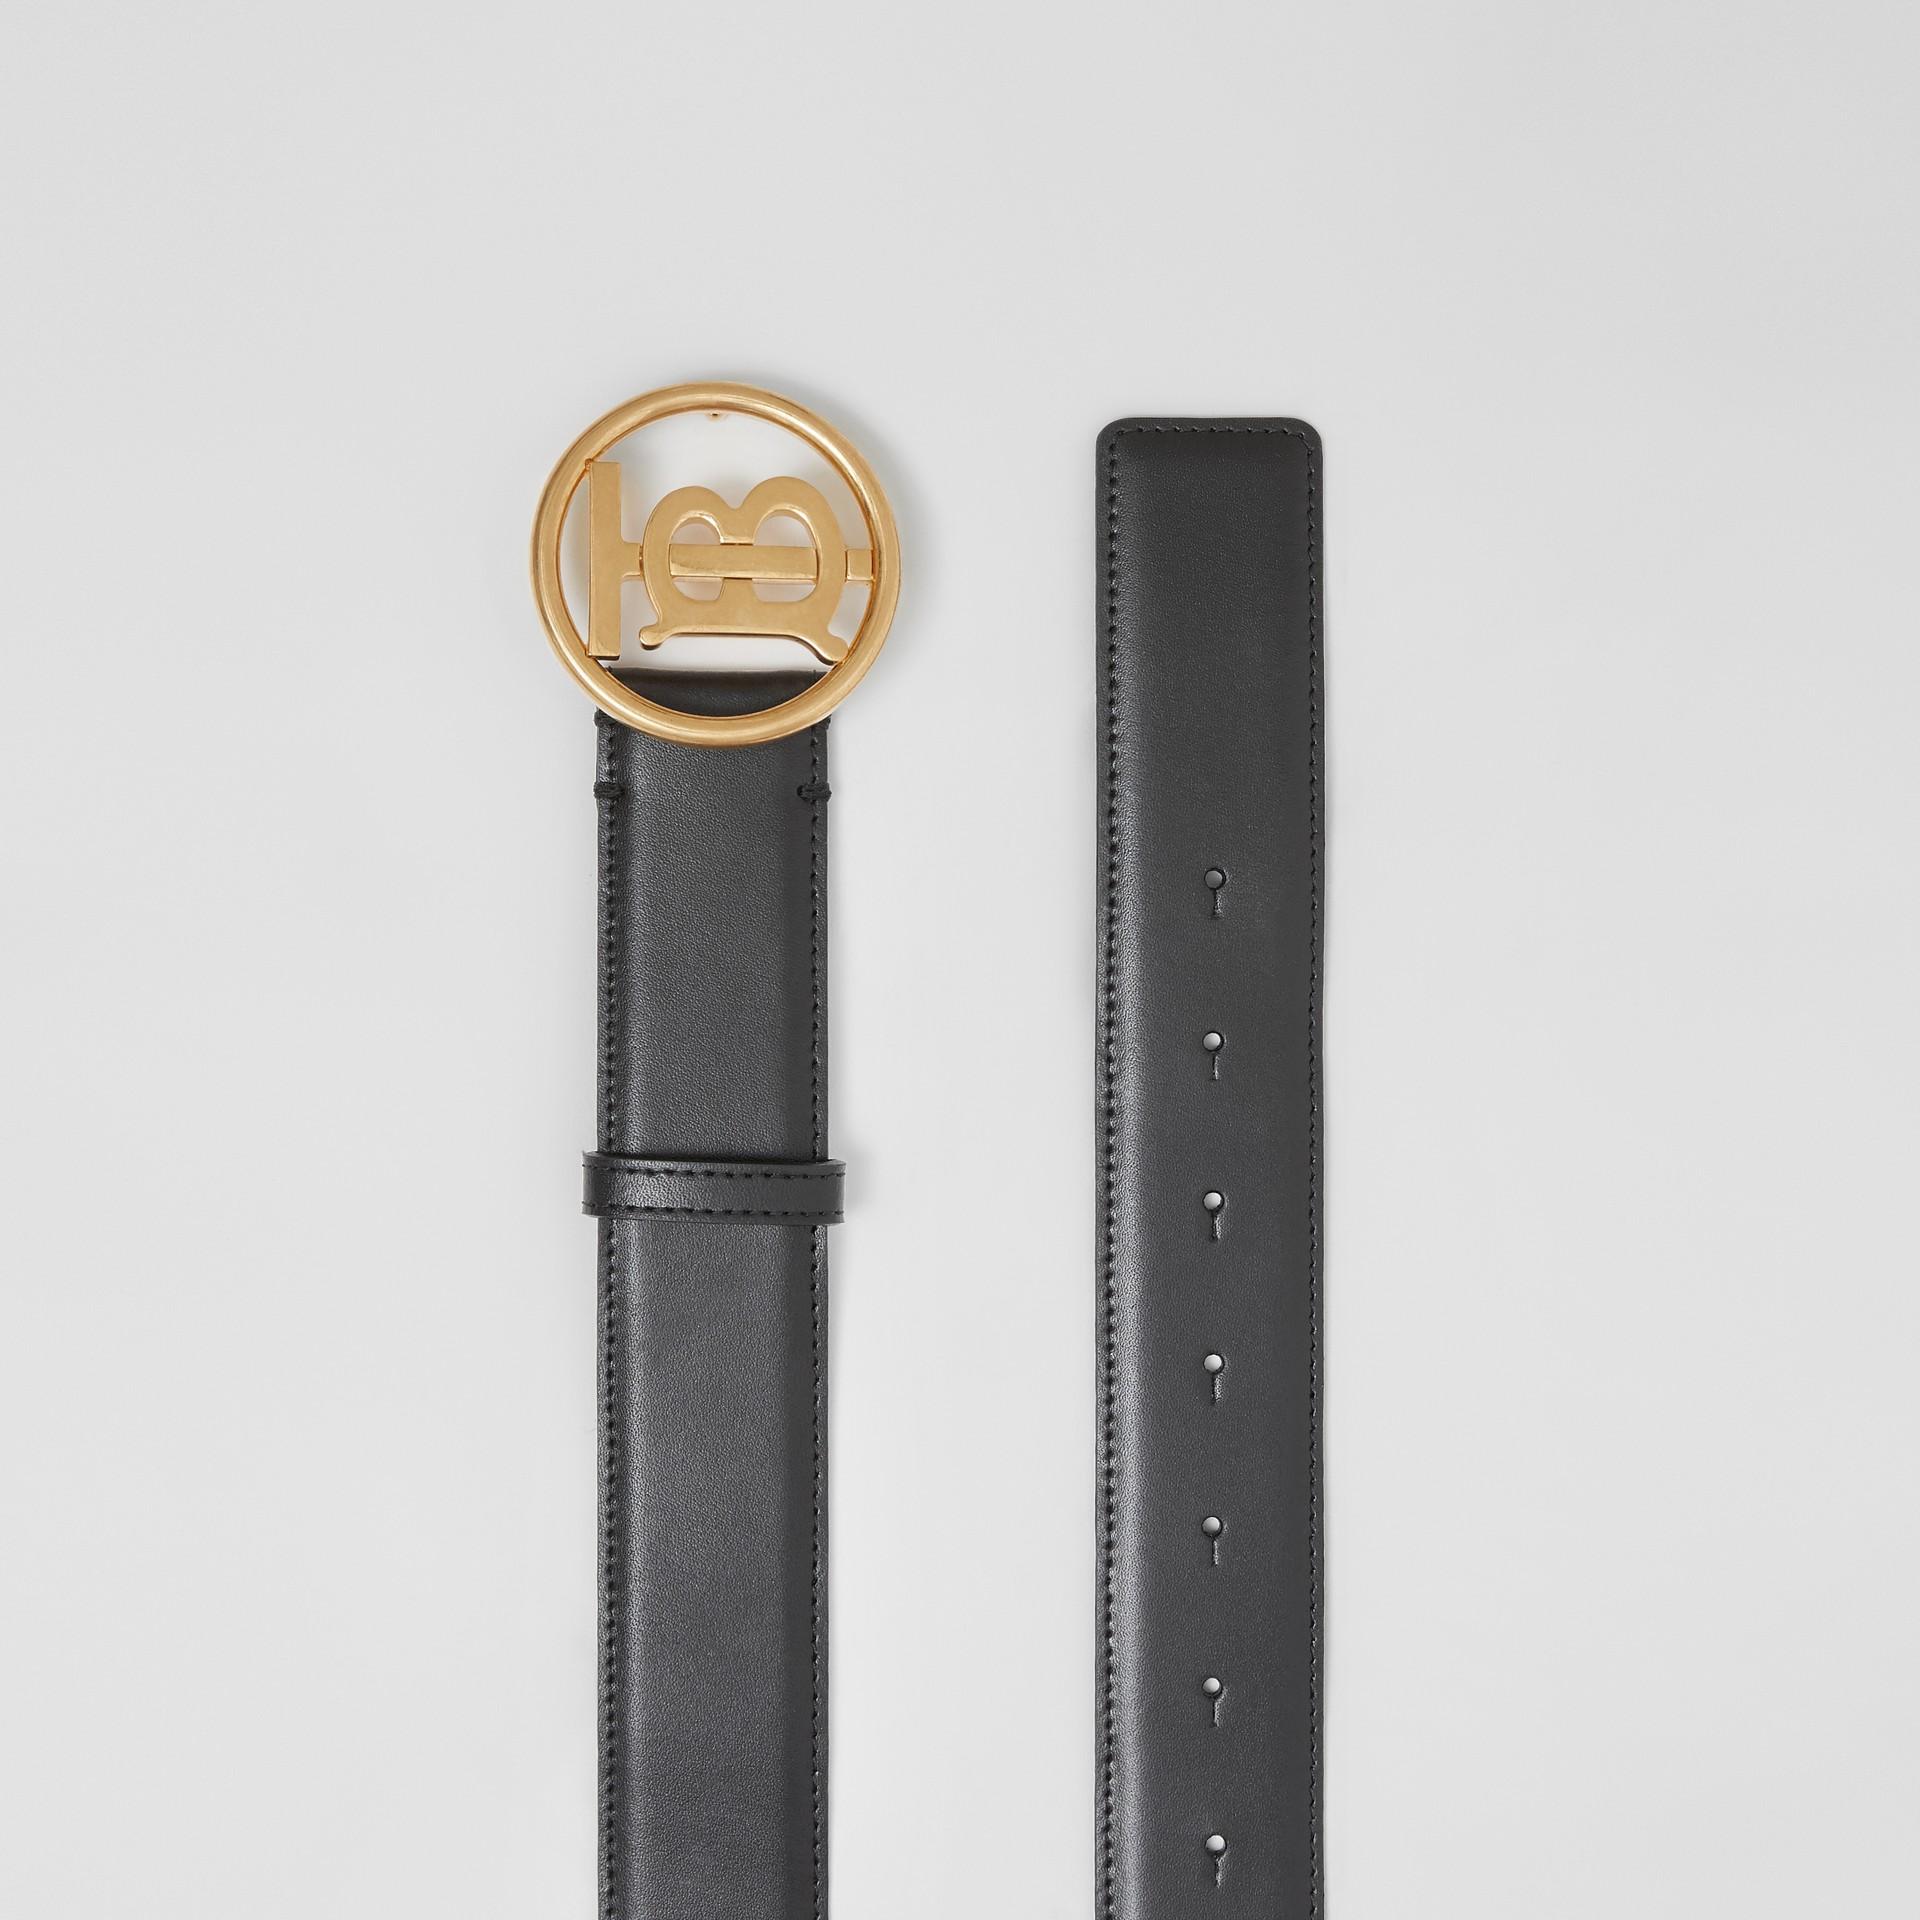 Monogram Motif Leather Belt in Black - Women | Burberry - gallery image 5